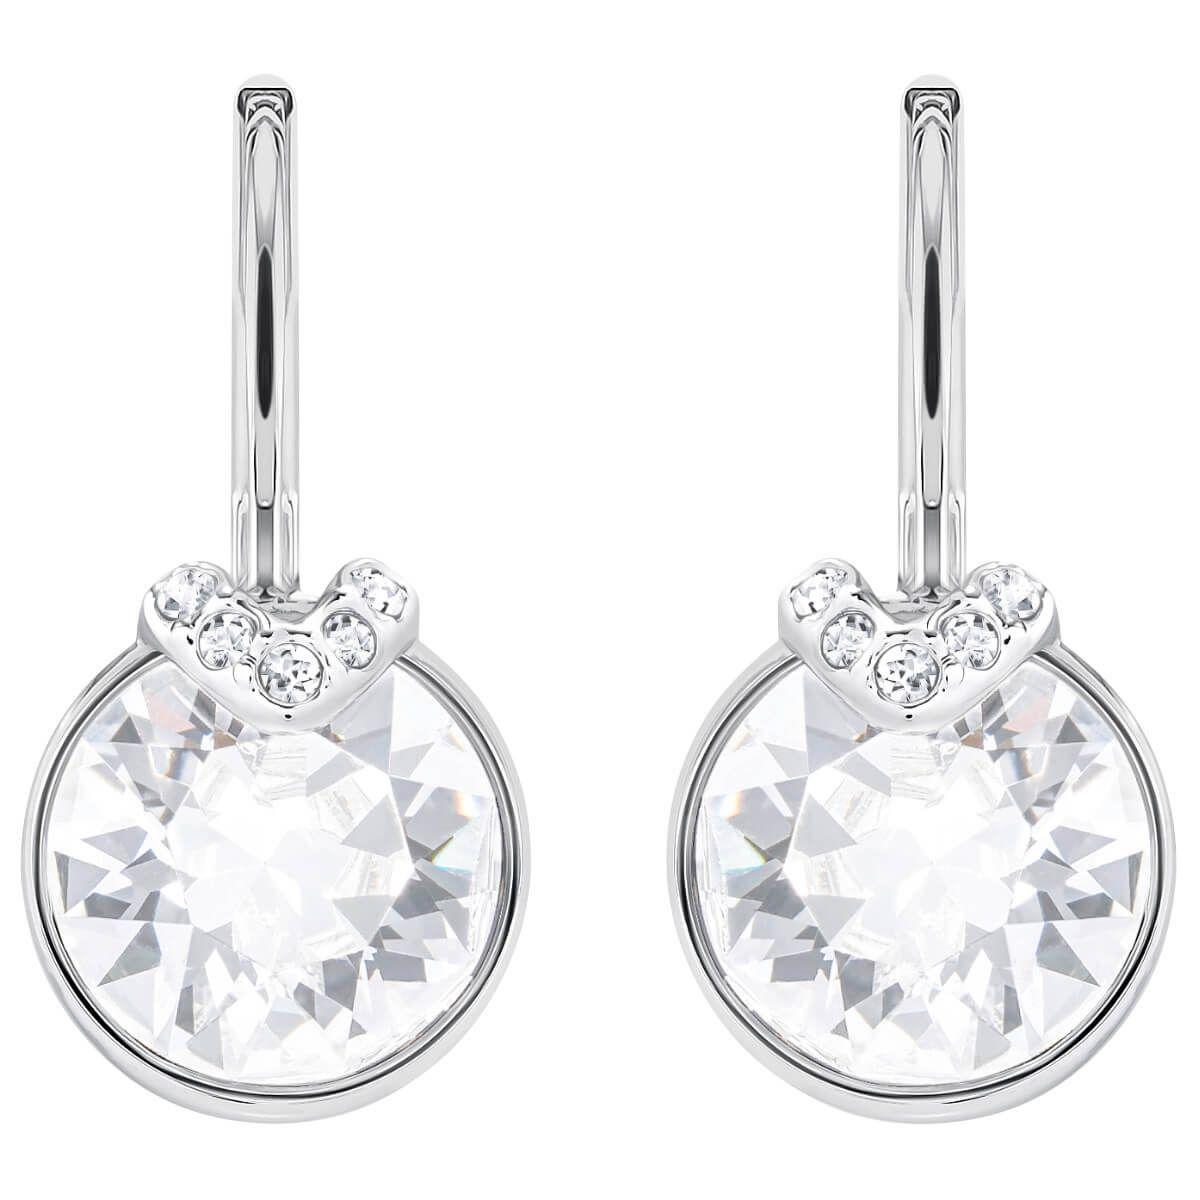 6ff3e0d1a Bella V Pierced Earrings, Gray, Rose gold plating | Birthday ...